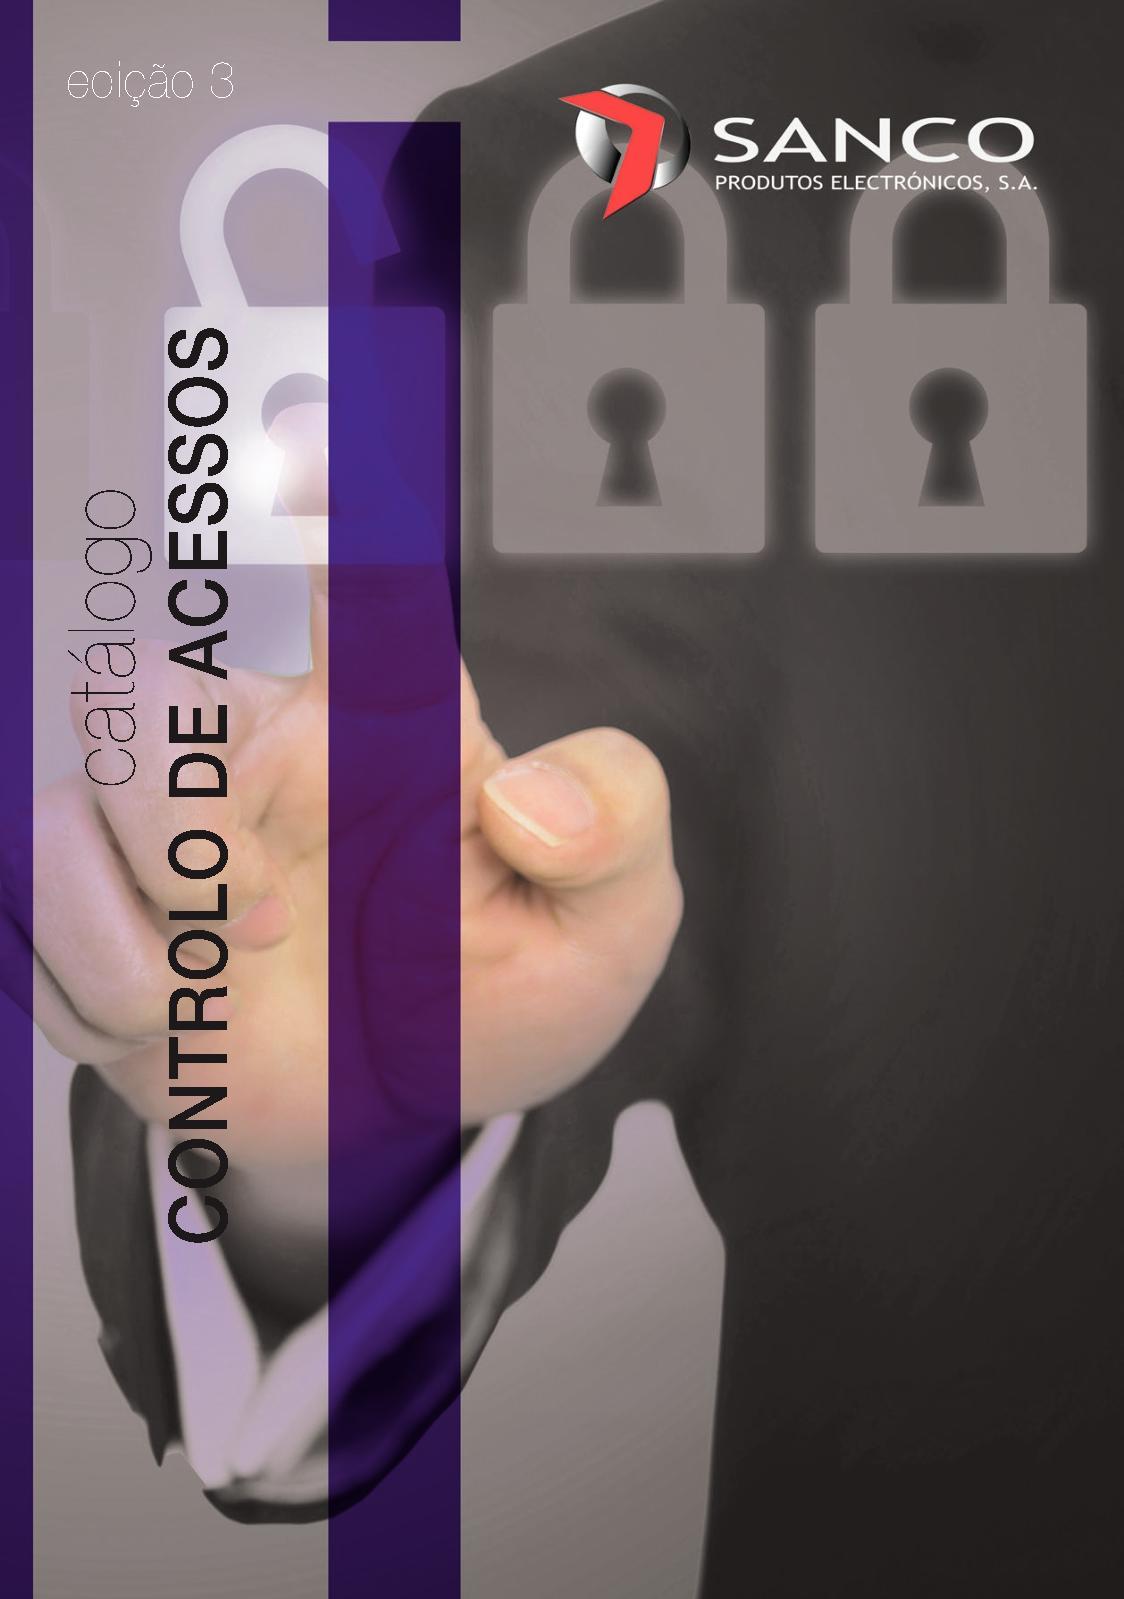 dc1cc1a76 Calaméo - Catalogo Controlo Acesso Ed3